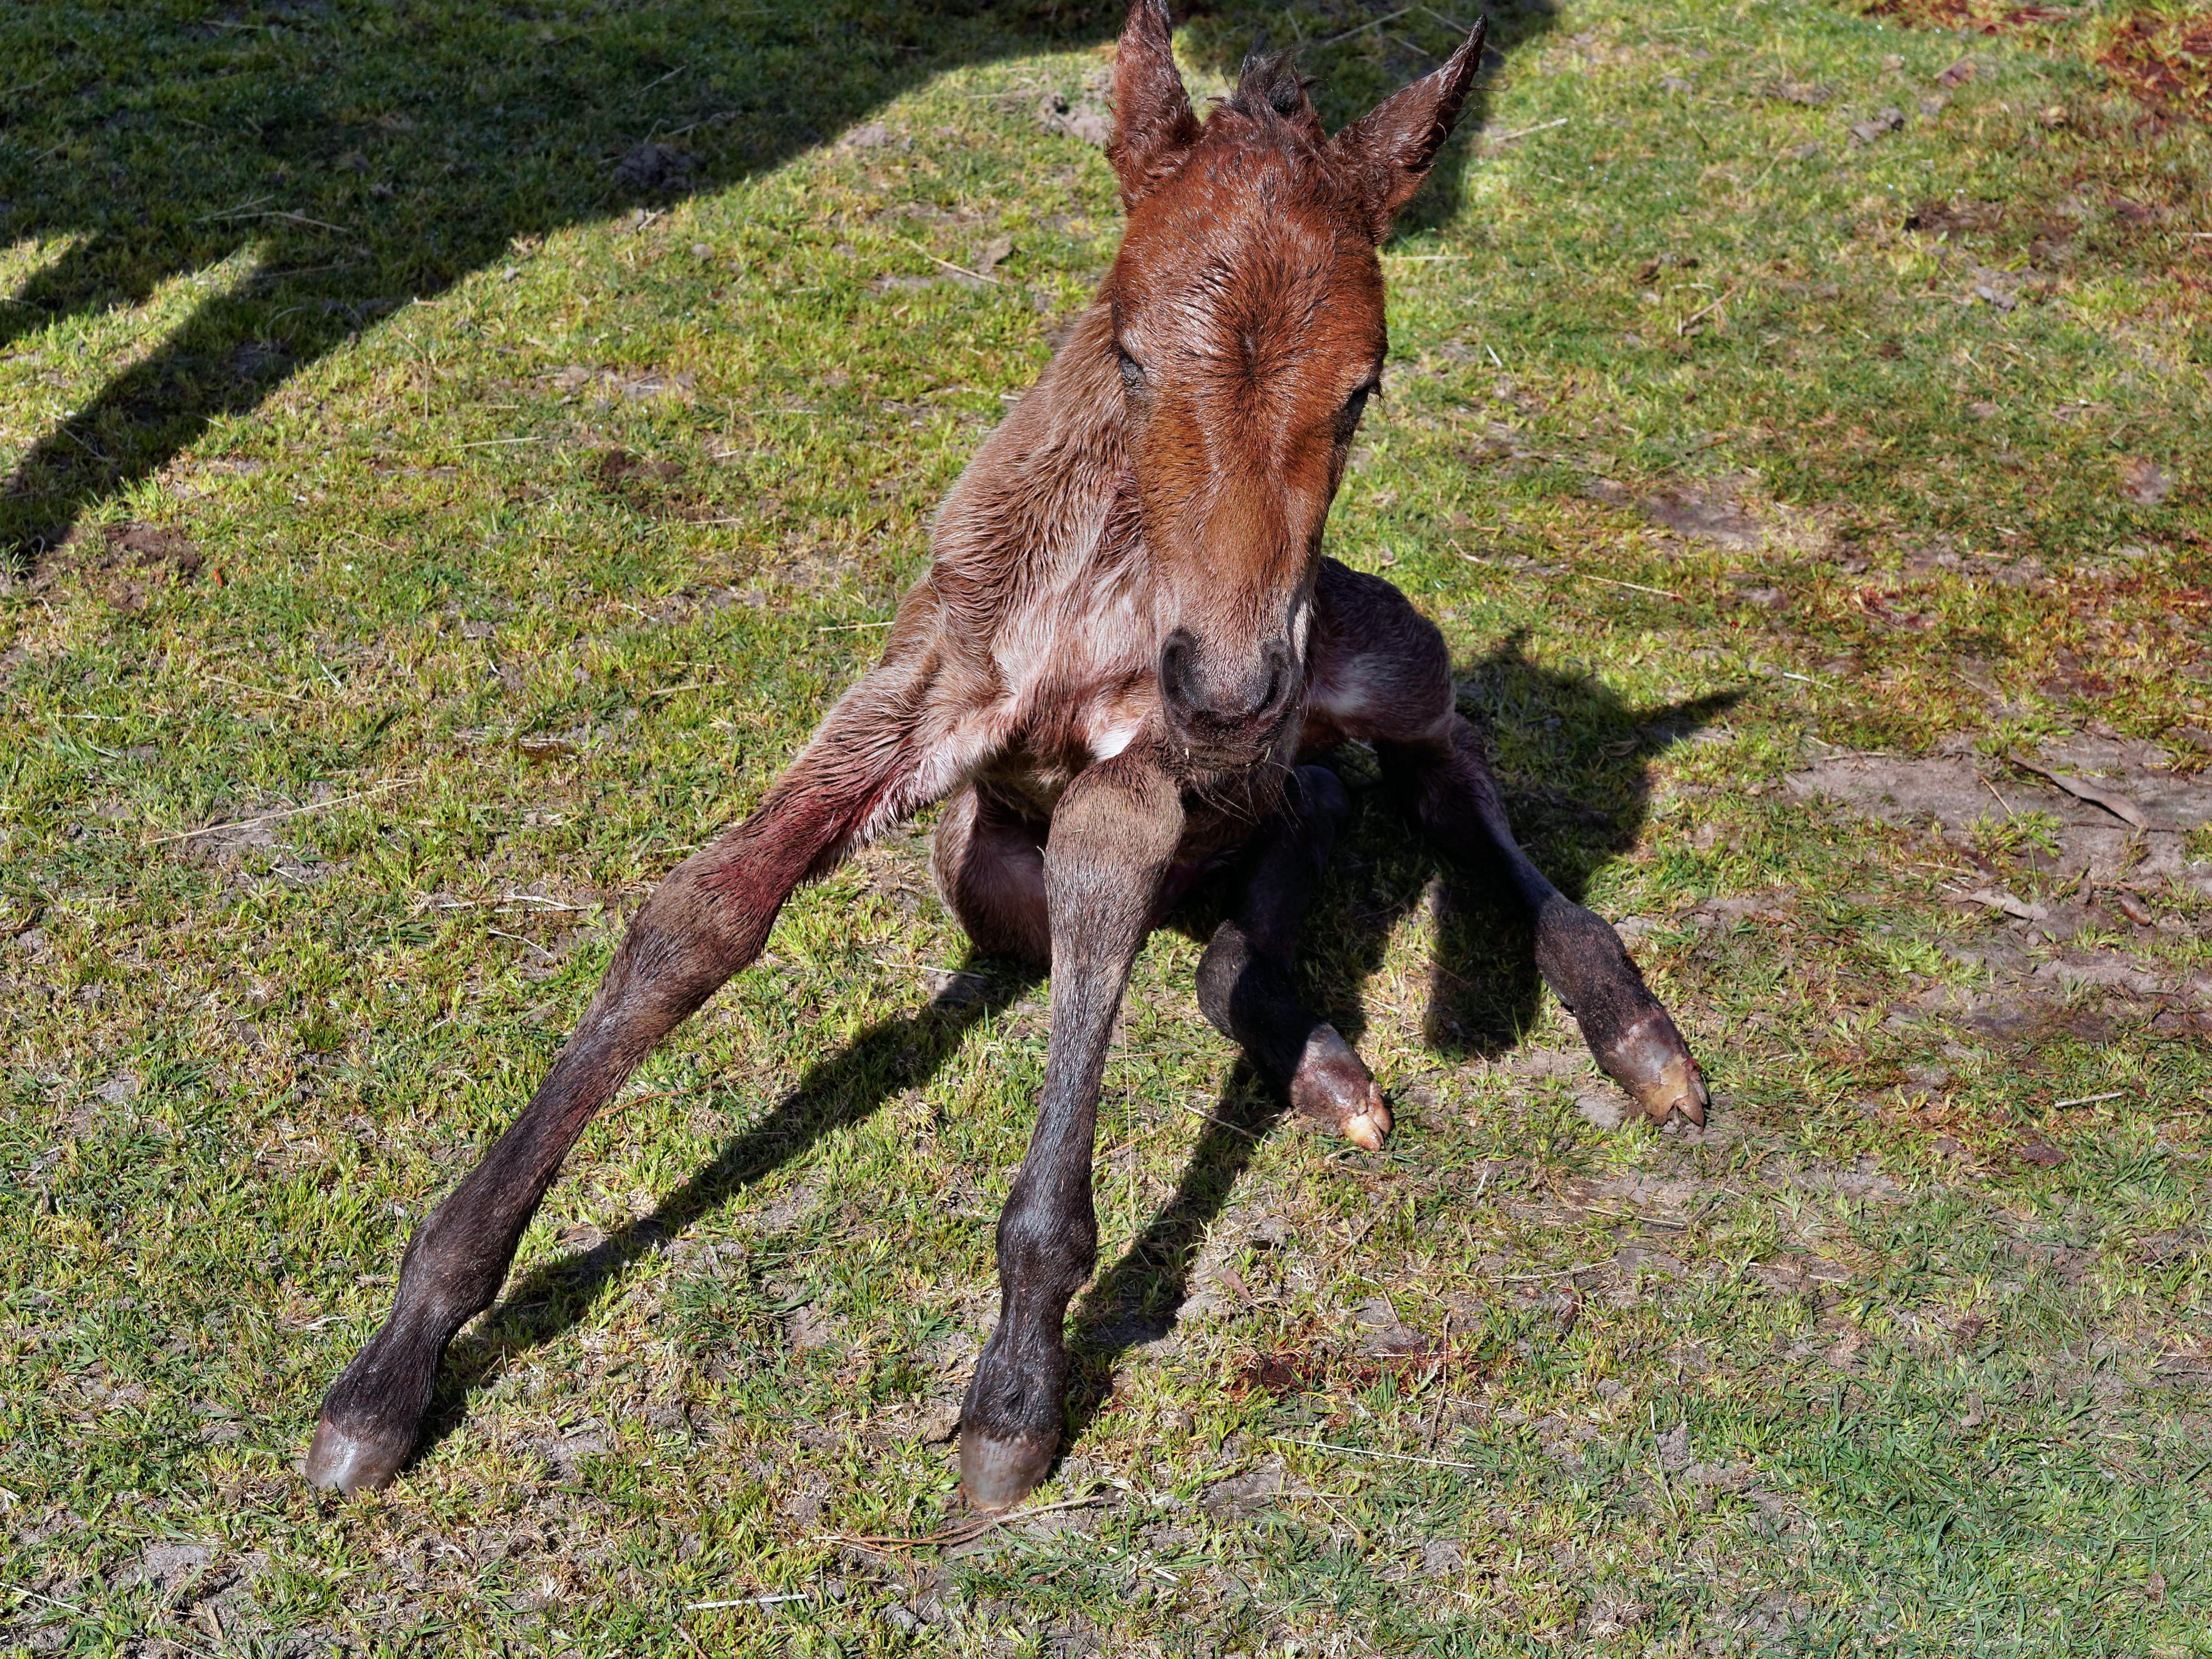 New-foal-12.jpeg